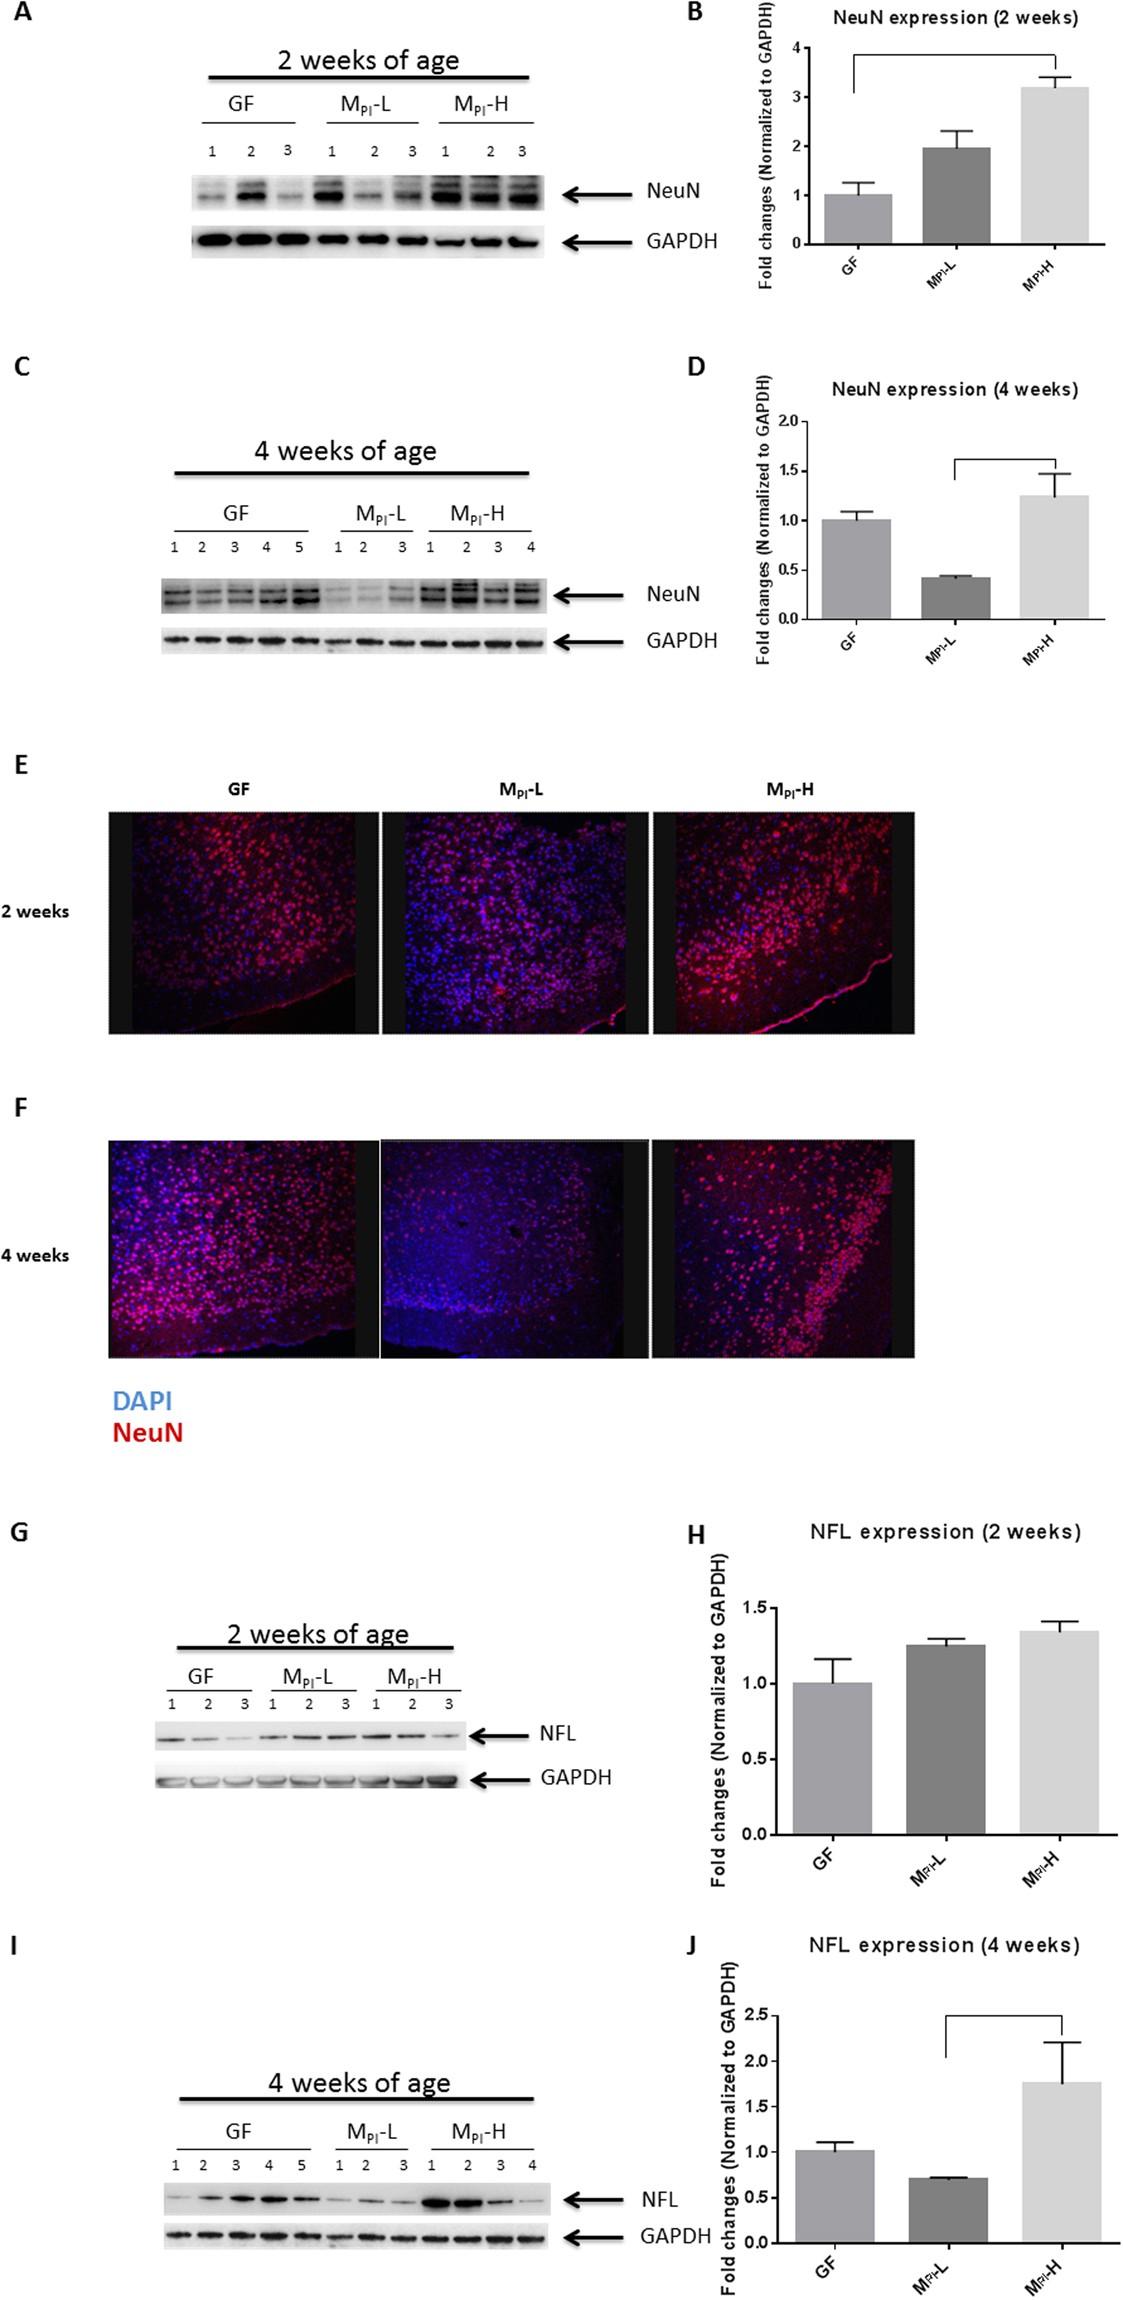 Ana Paula Fernández Santacruz Ruiz effects of intestinal microbiota on brain development in